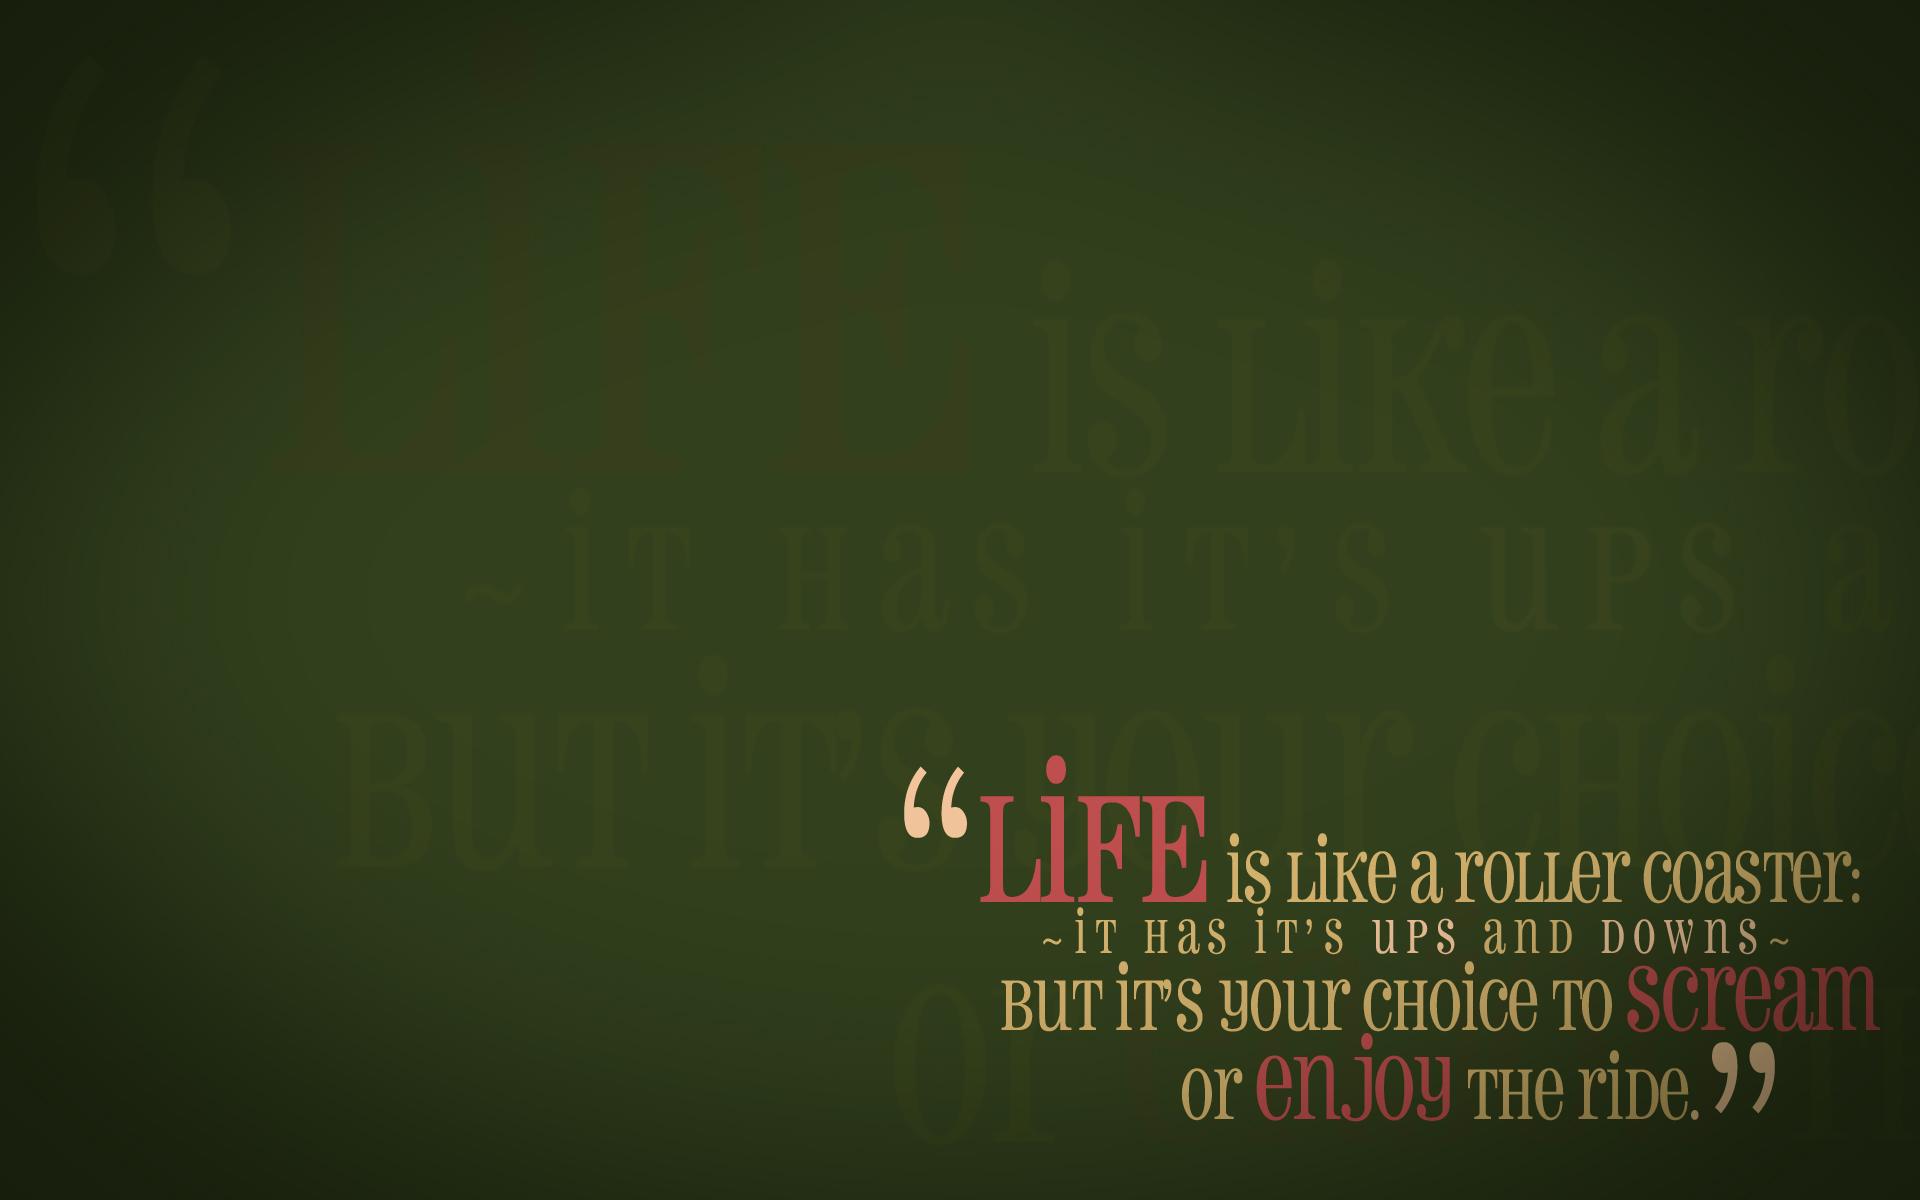 Life-Motivational-Quotes-Wallpaper-HD-free-for-desktops